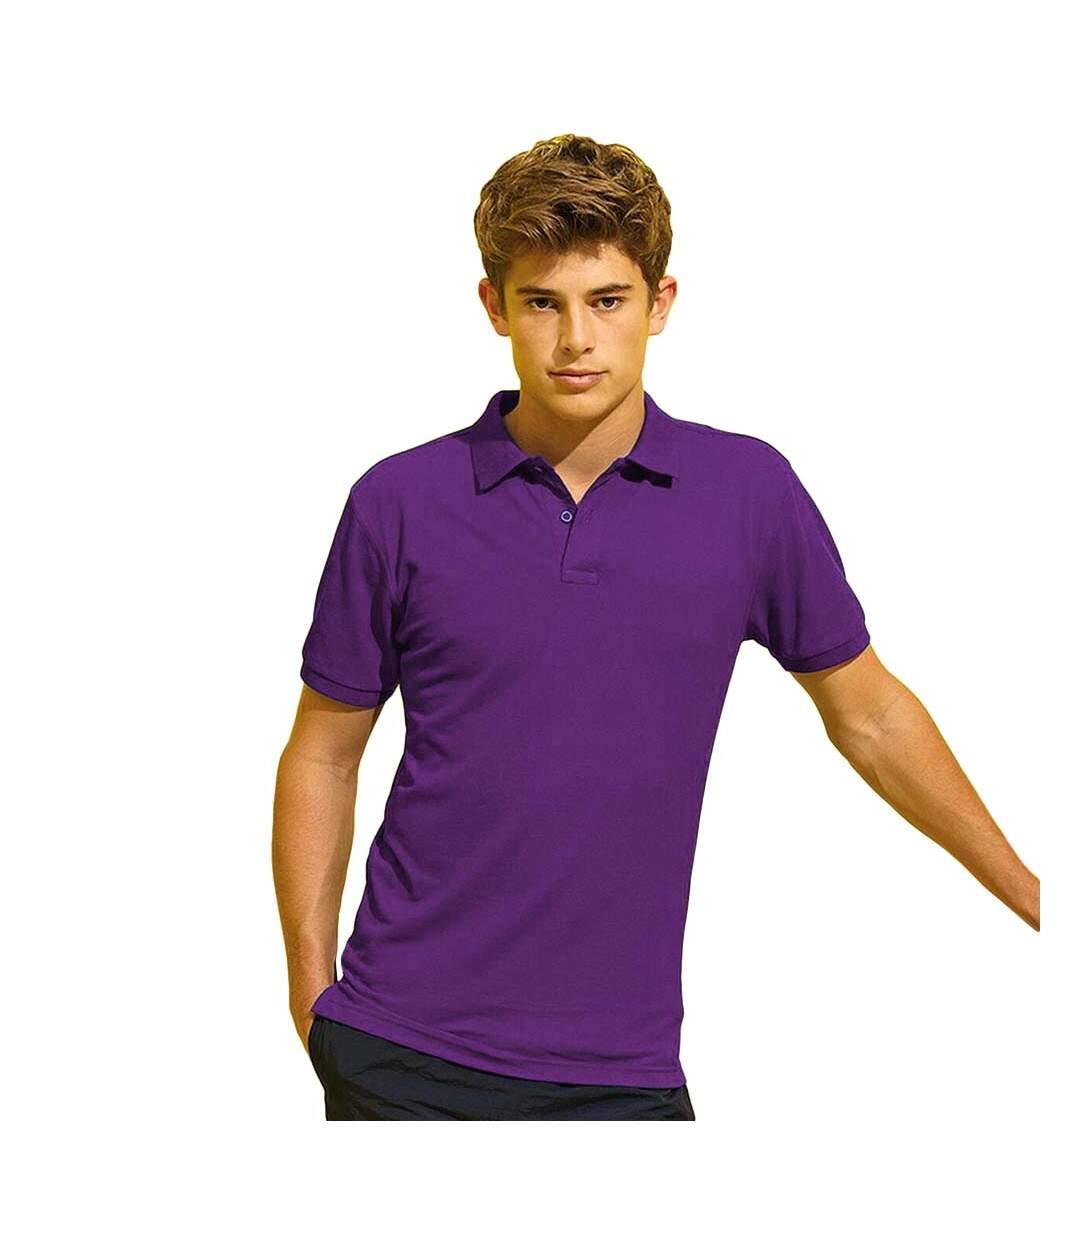 Asquith & Fox Mens Short Sleeve Performance Blend Polo Shirt (Purple) - UTRW5350